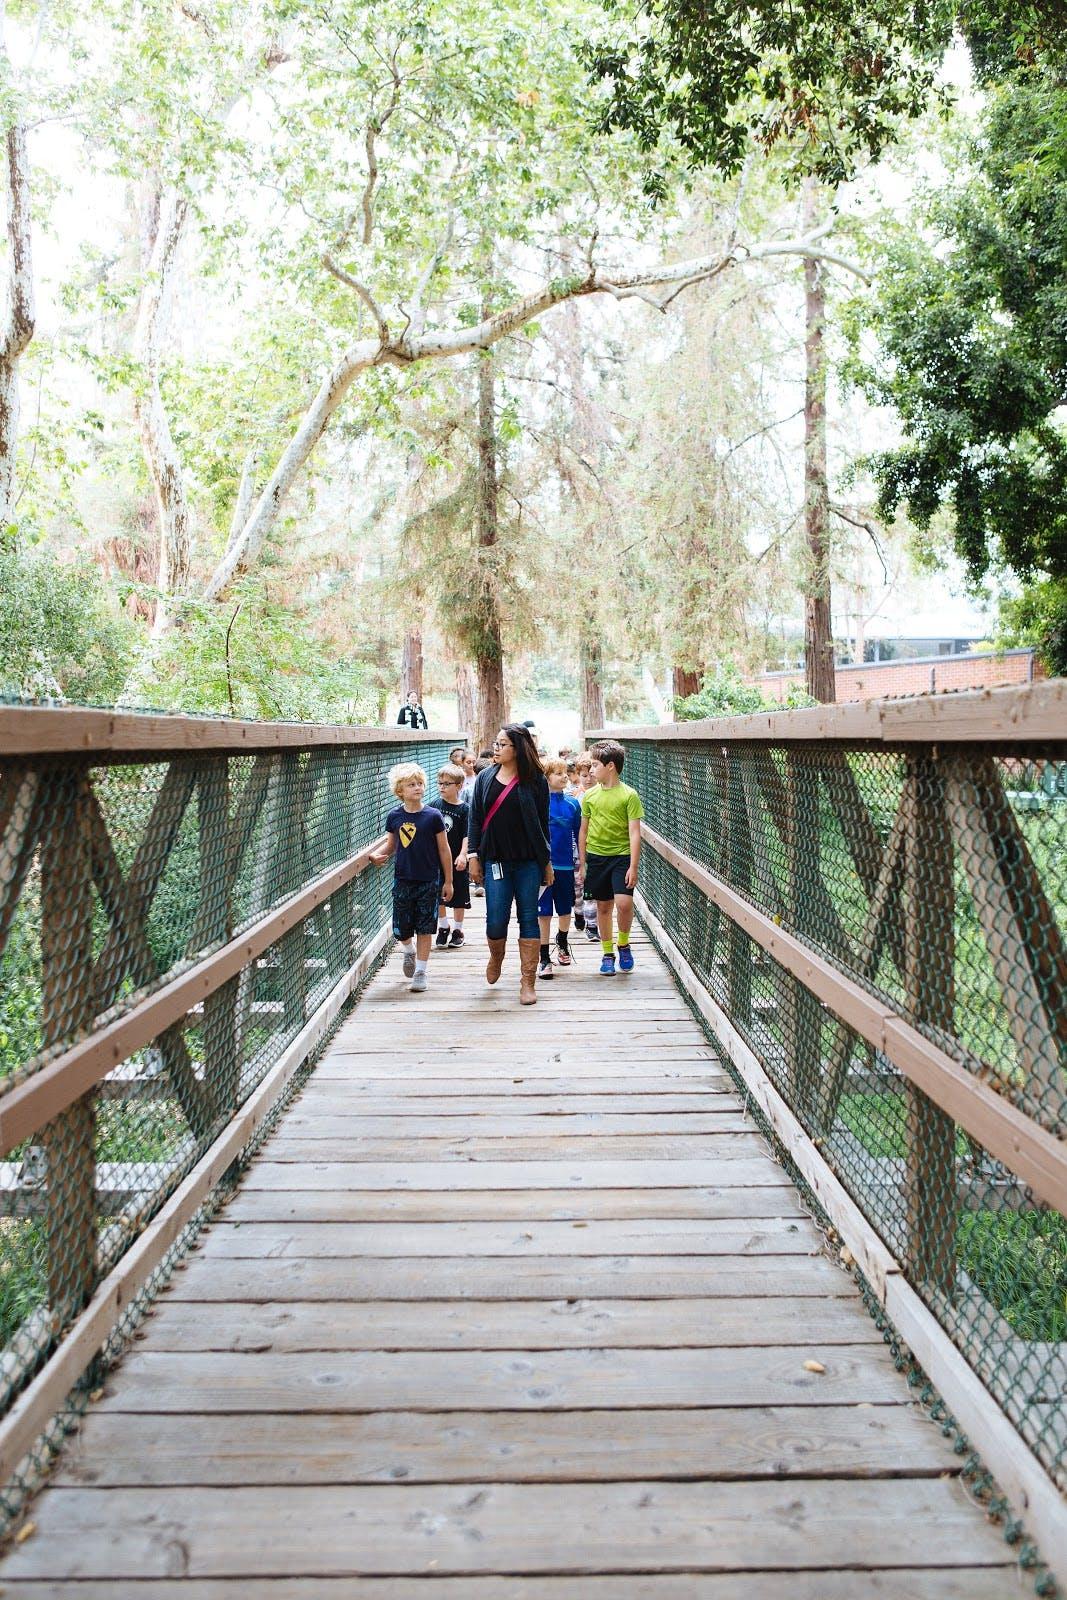 kids walking on a bridge